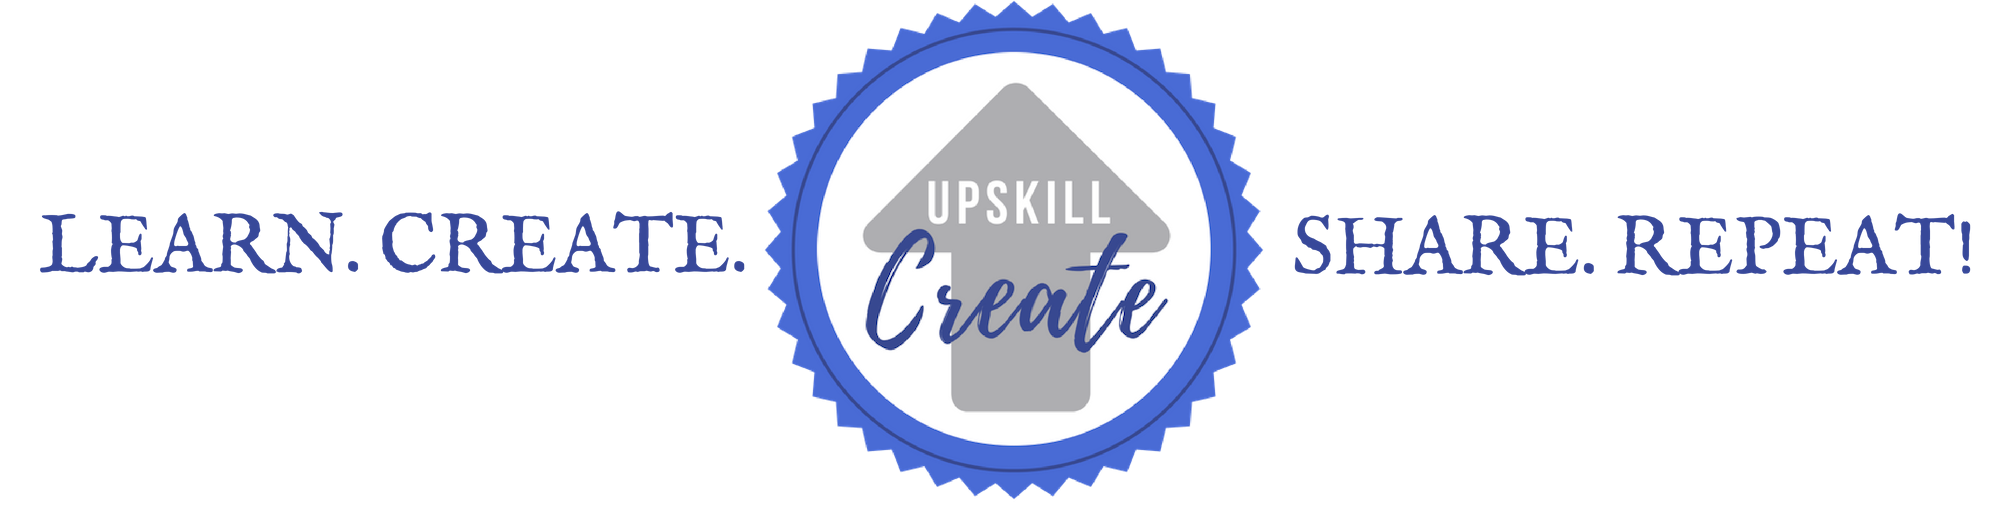 Upskill Create